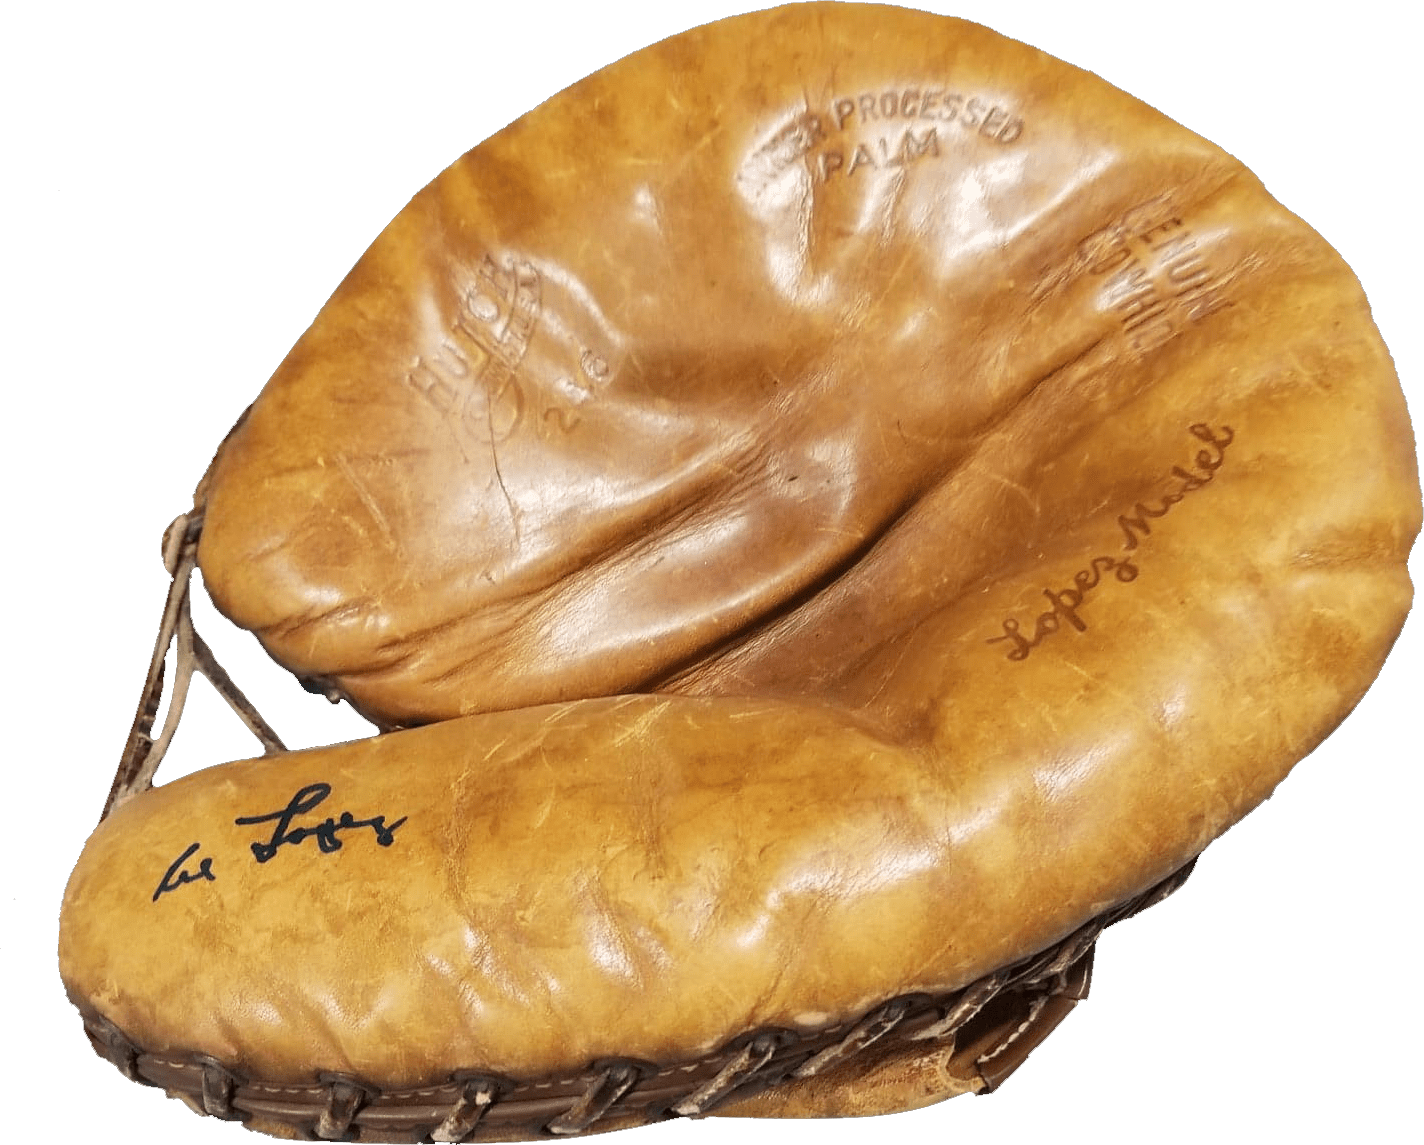 al lopez's glove